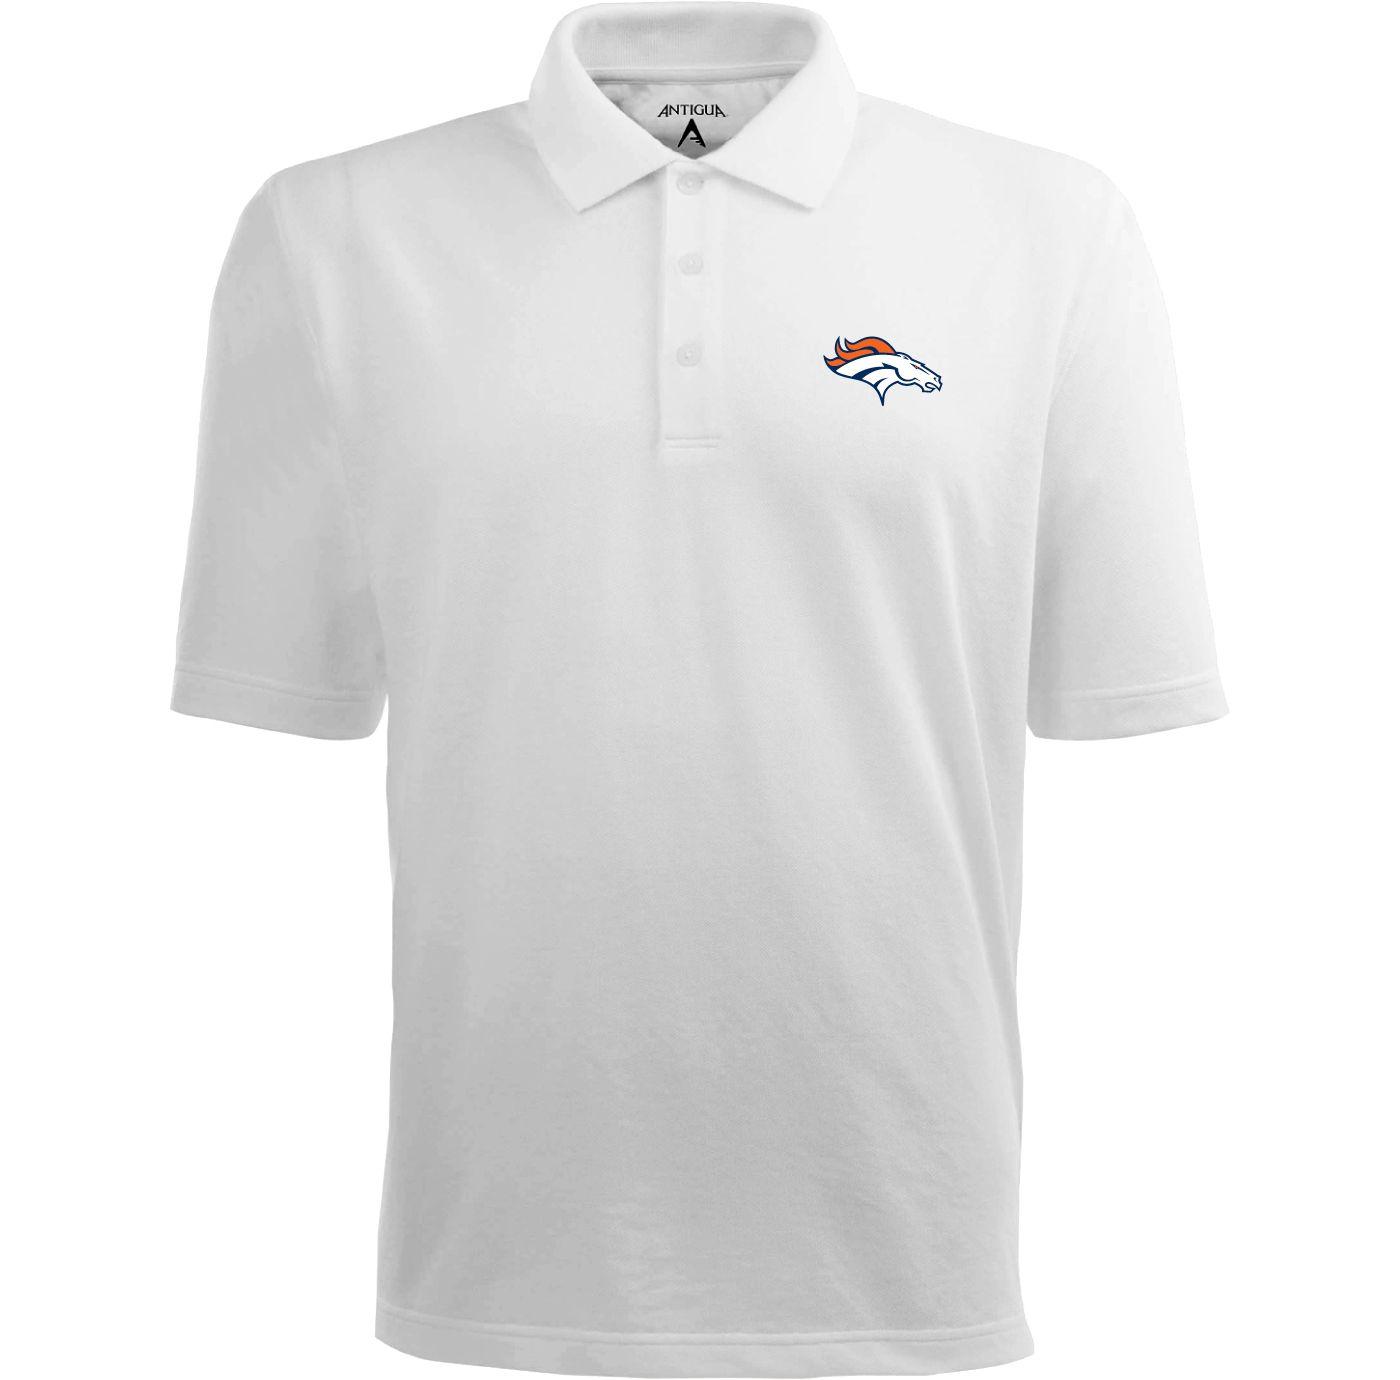 Antigua Men's Denver Broncos Pique Xtra-Lite White Polo